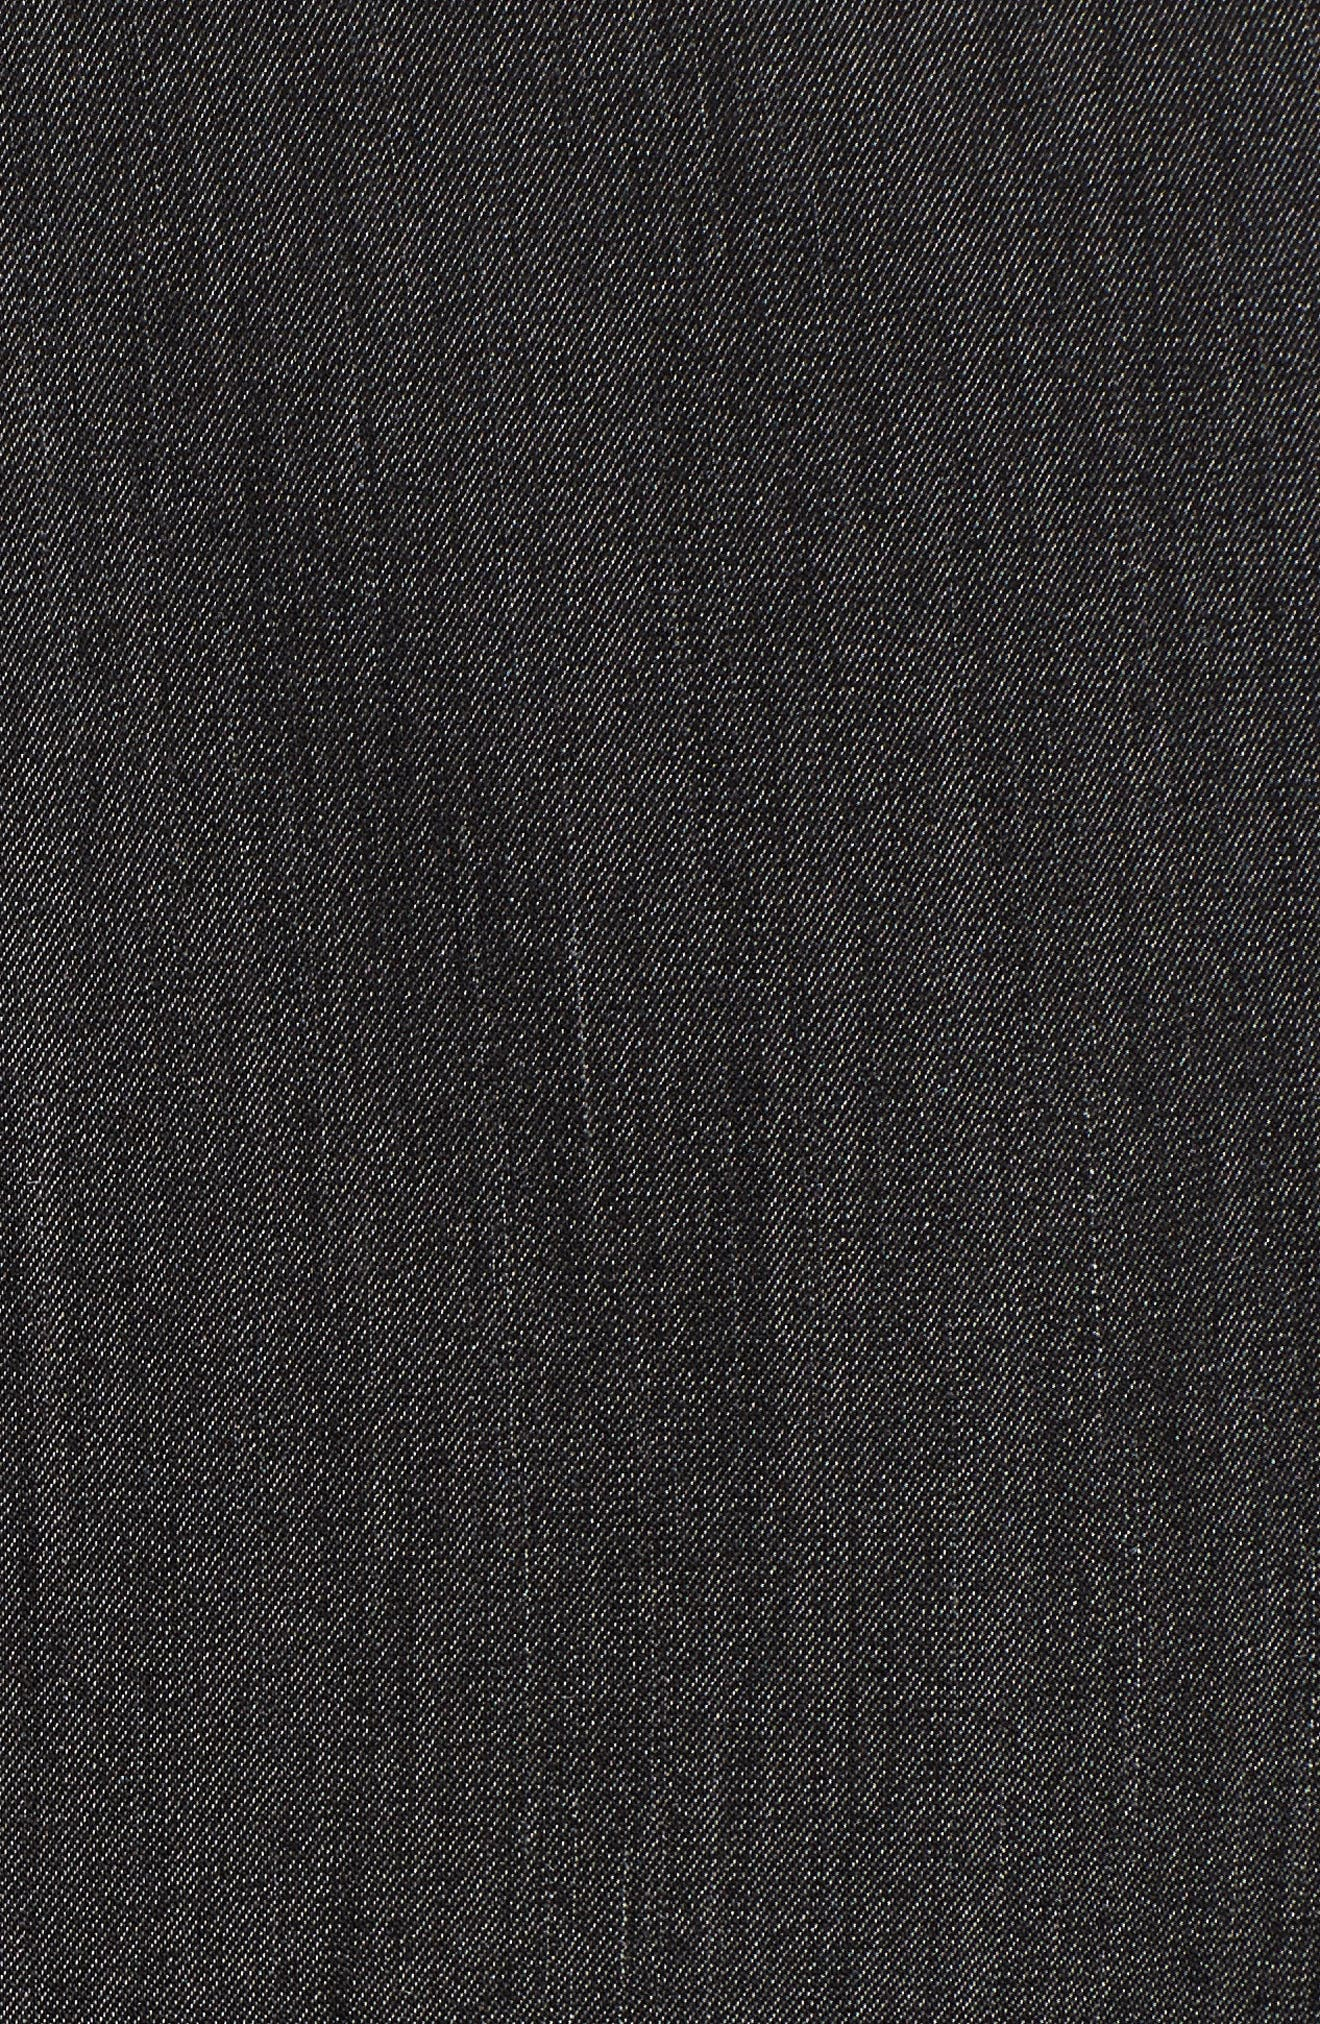 Notch Collar Stretch Denim Dress,                             Alternate thumbnail 5, color,                             001